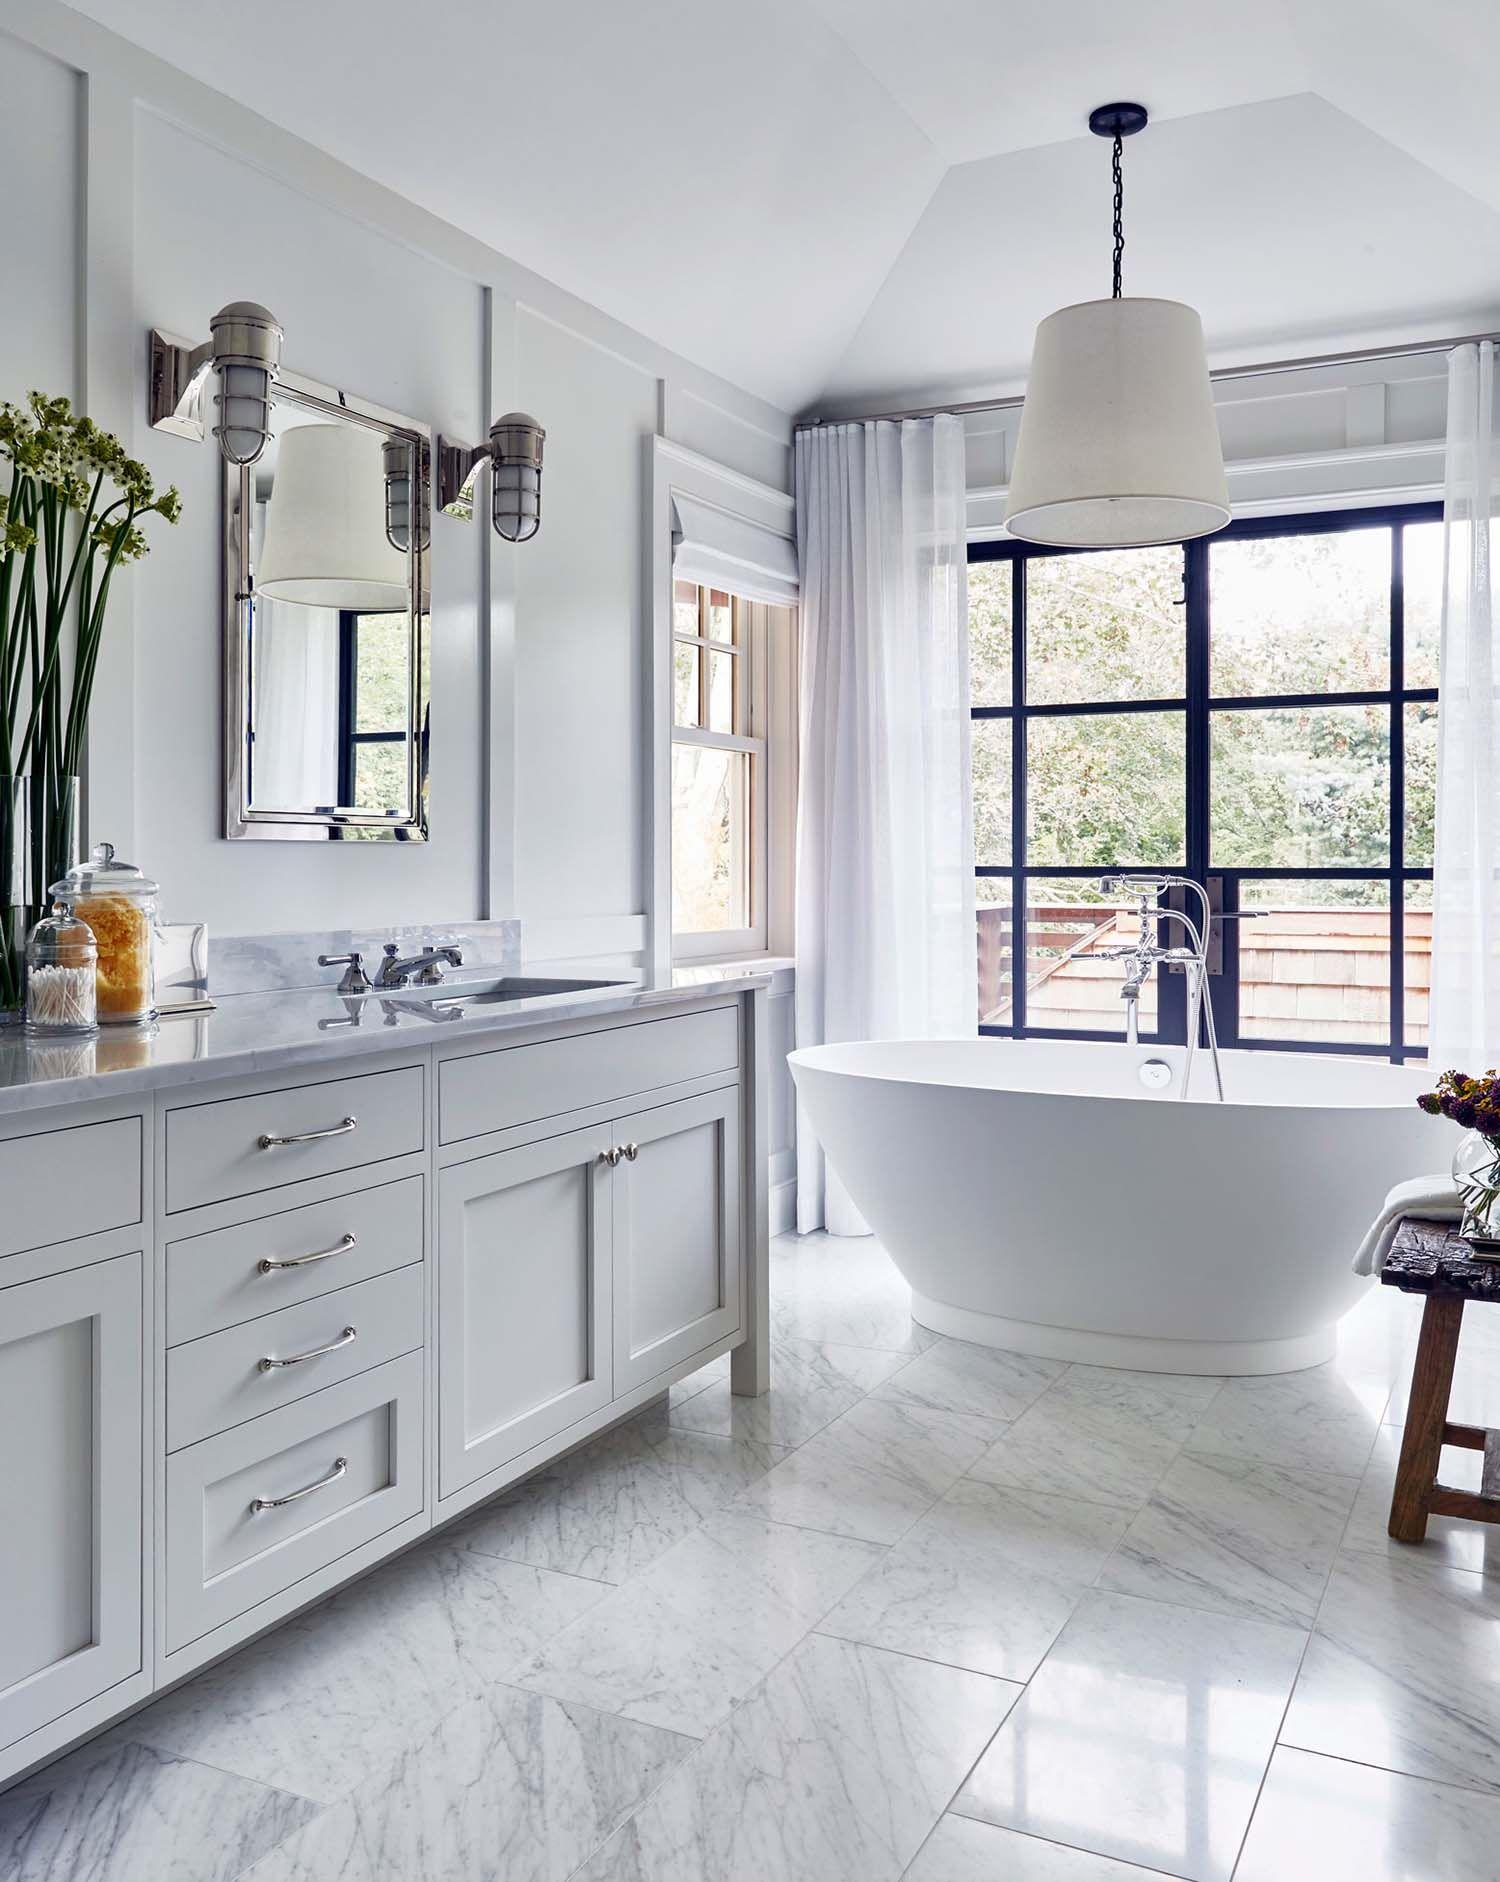 captivating contemporary coastal interior design | Captivating beach house in Amagansett with stylish details ...